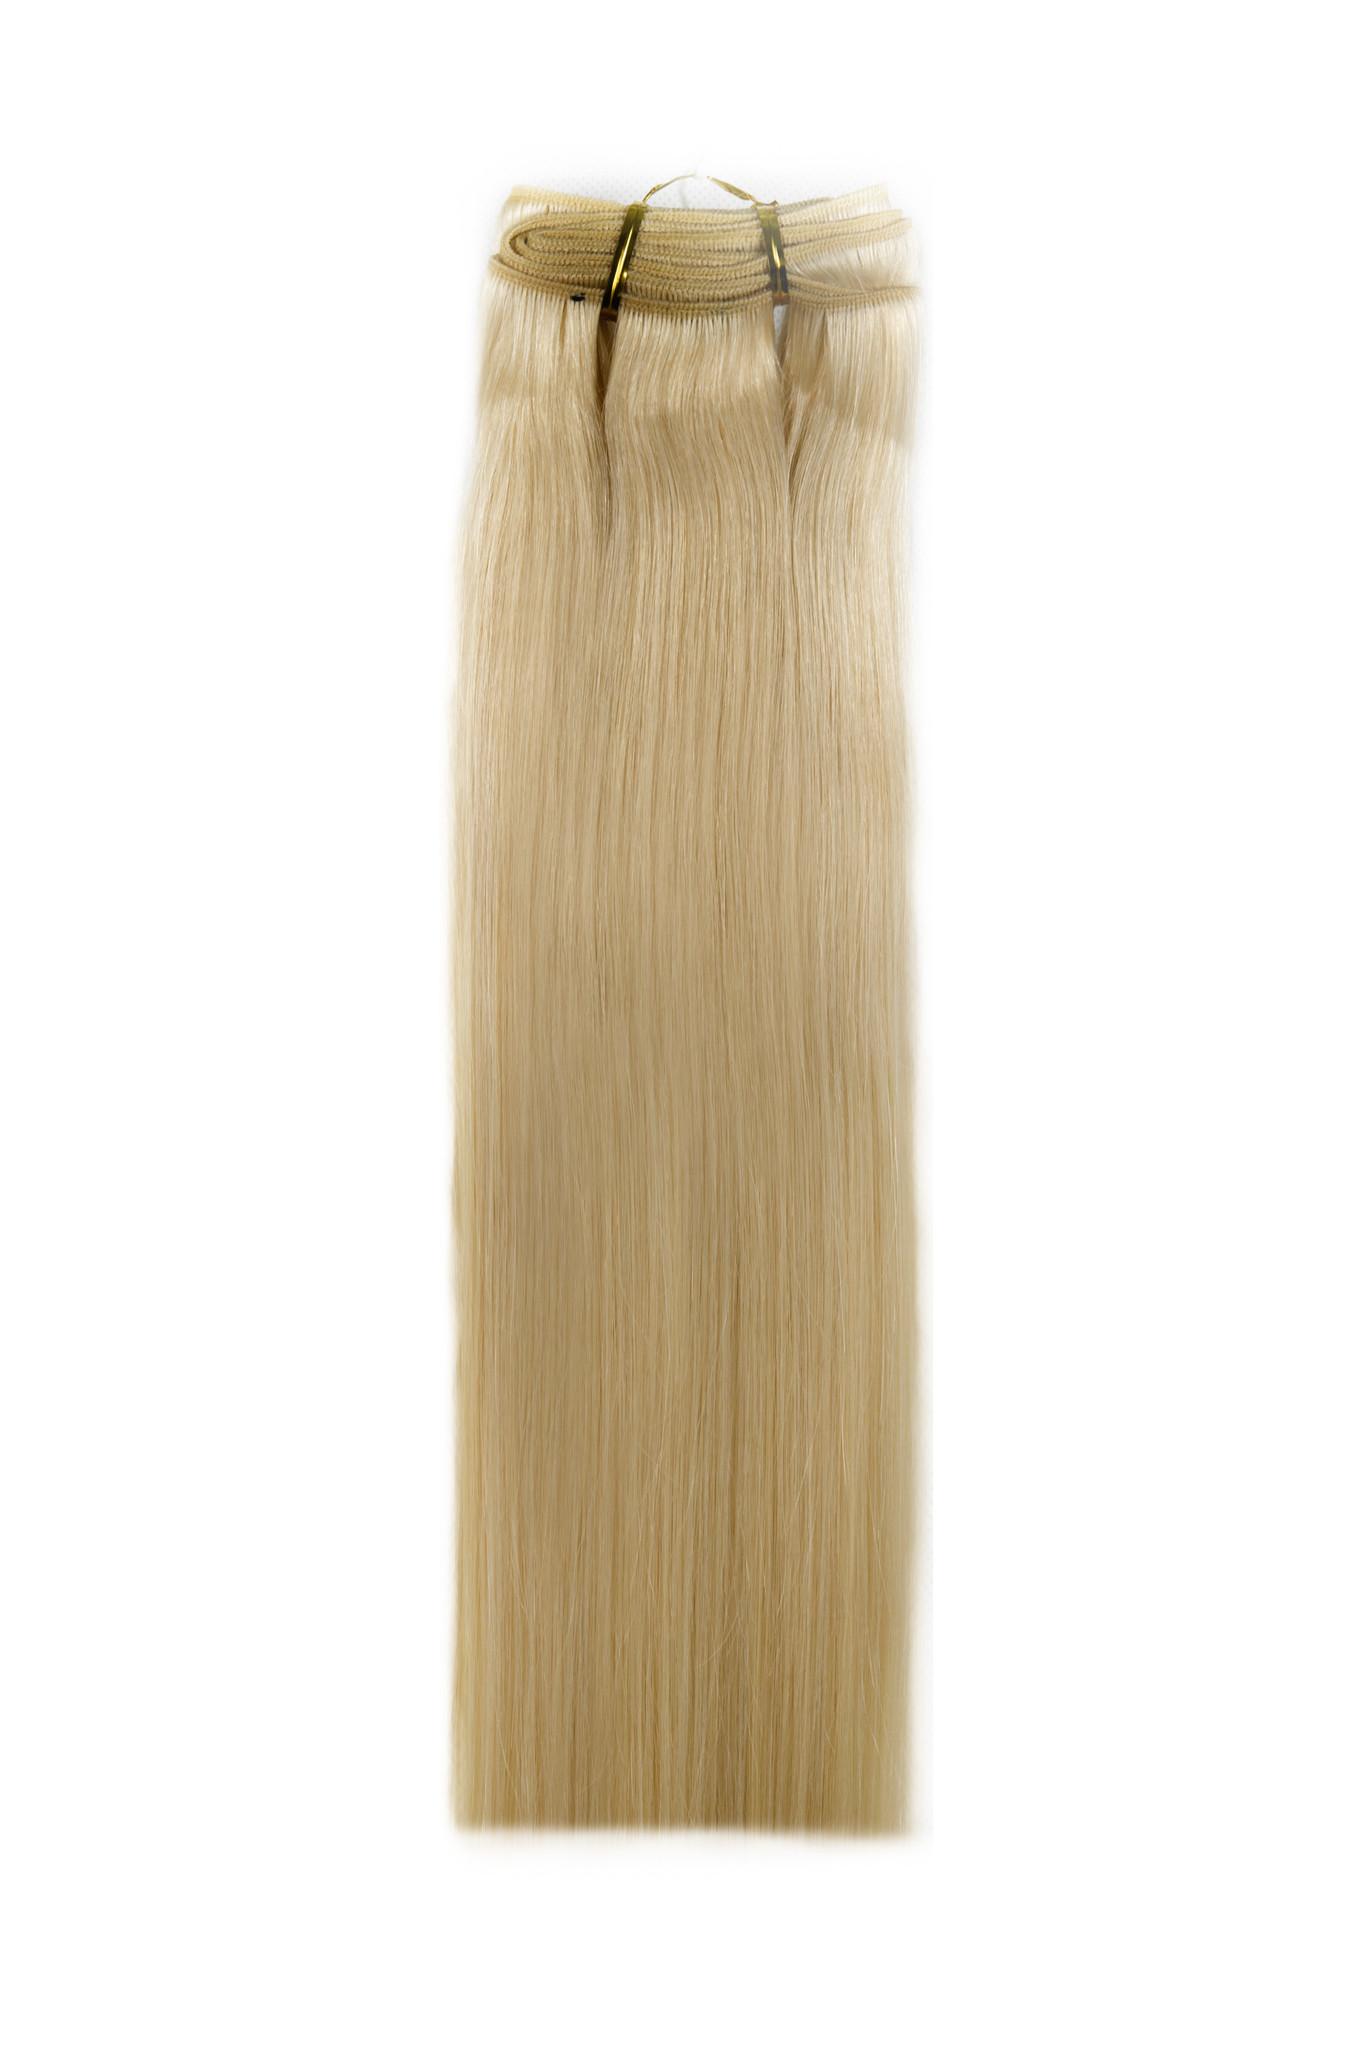 SilverFox Weave - #60 White Blonde